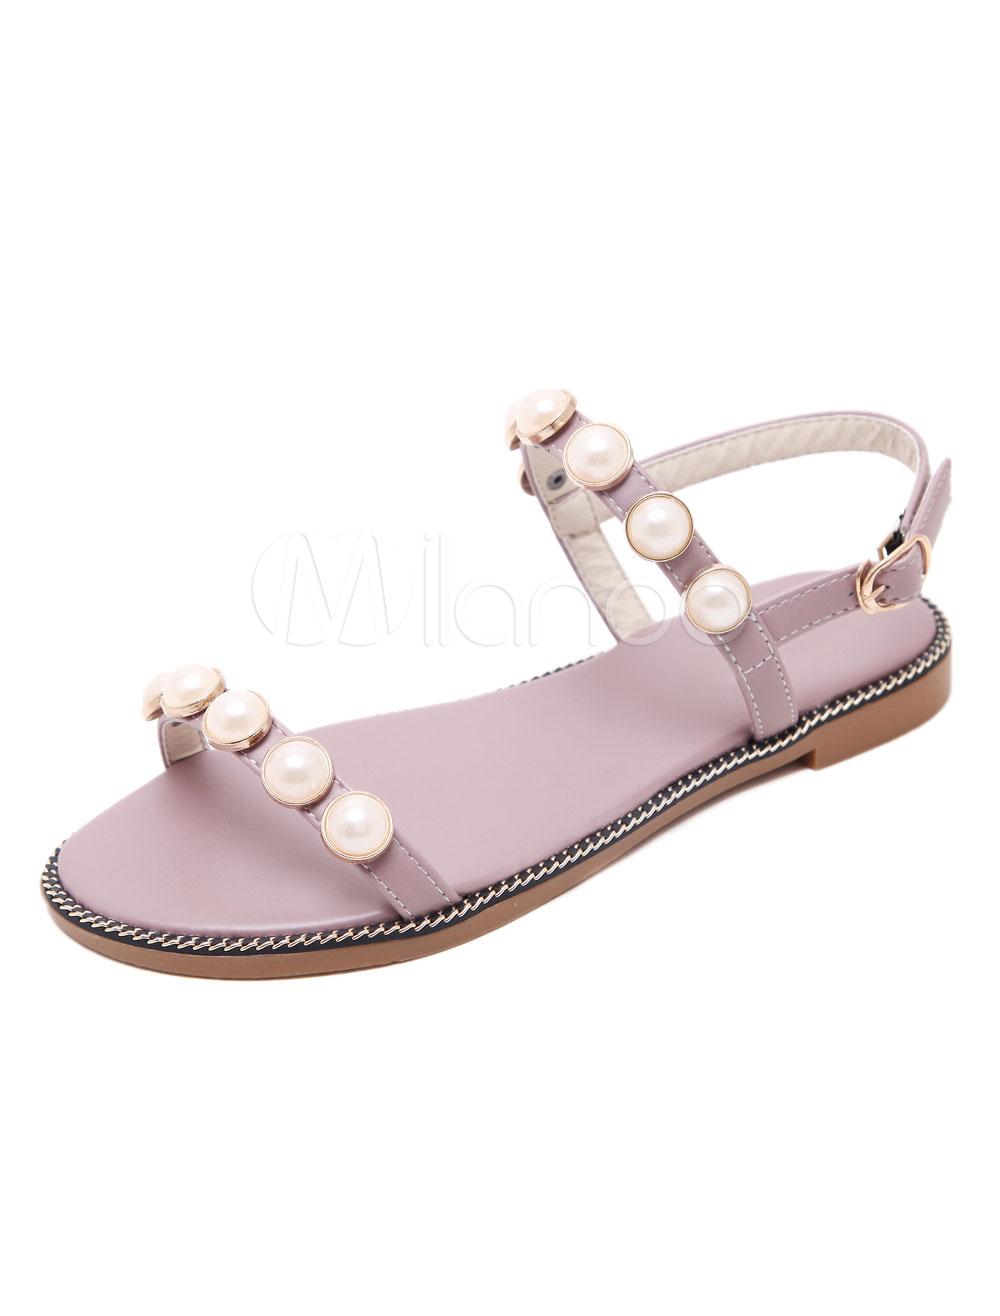 8b48d1d33e6 Pink Flat Sandals Open Toe Pearls Beaded Sandal Shoes For Women ...